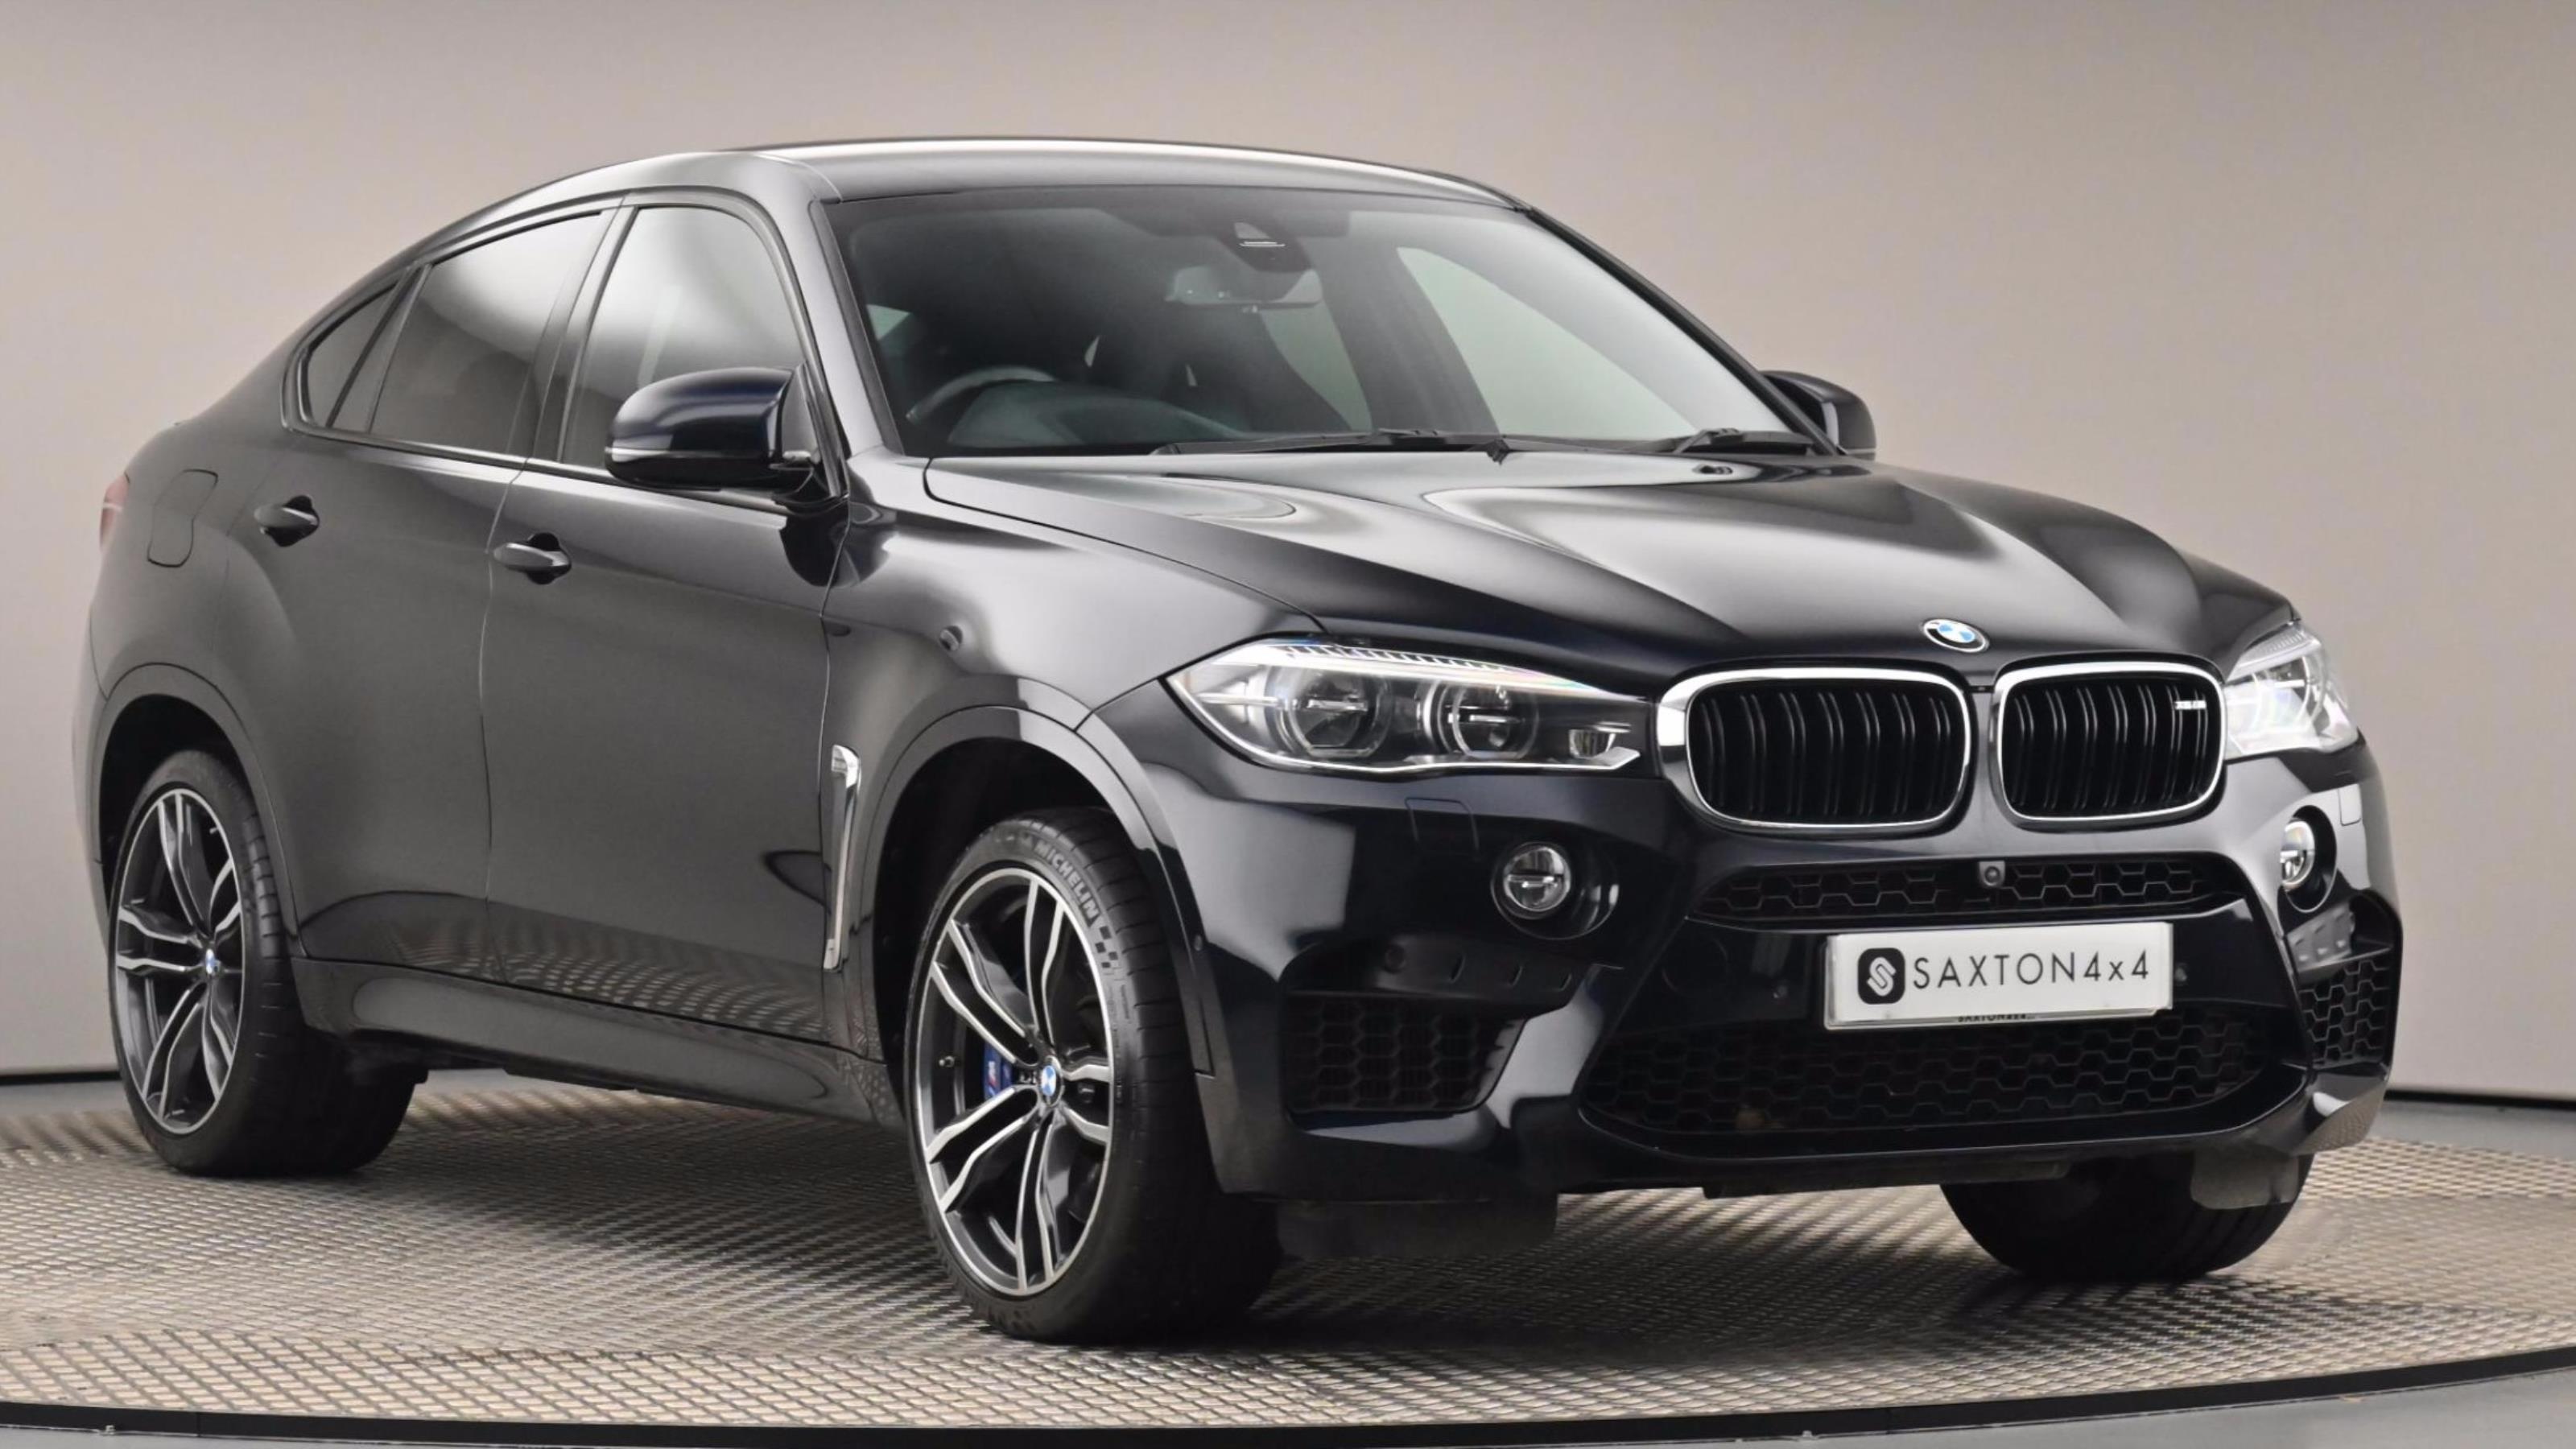 Used 2018 BMW X6 M xDrive X6 M 5dr Auto Black at Saxton4x4